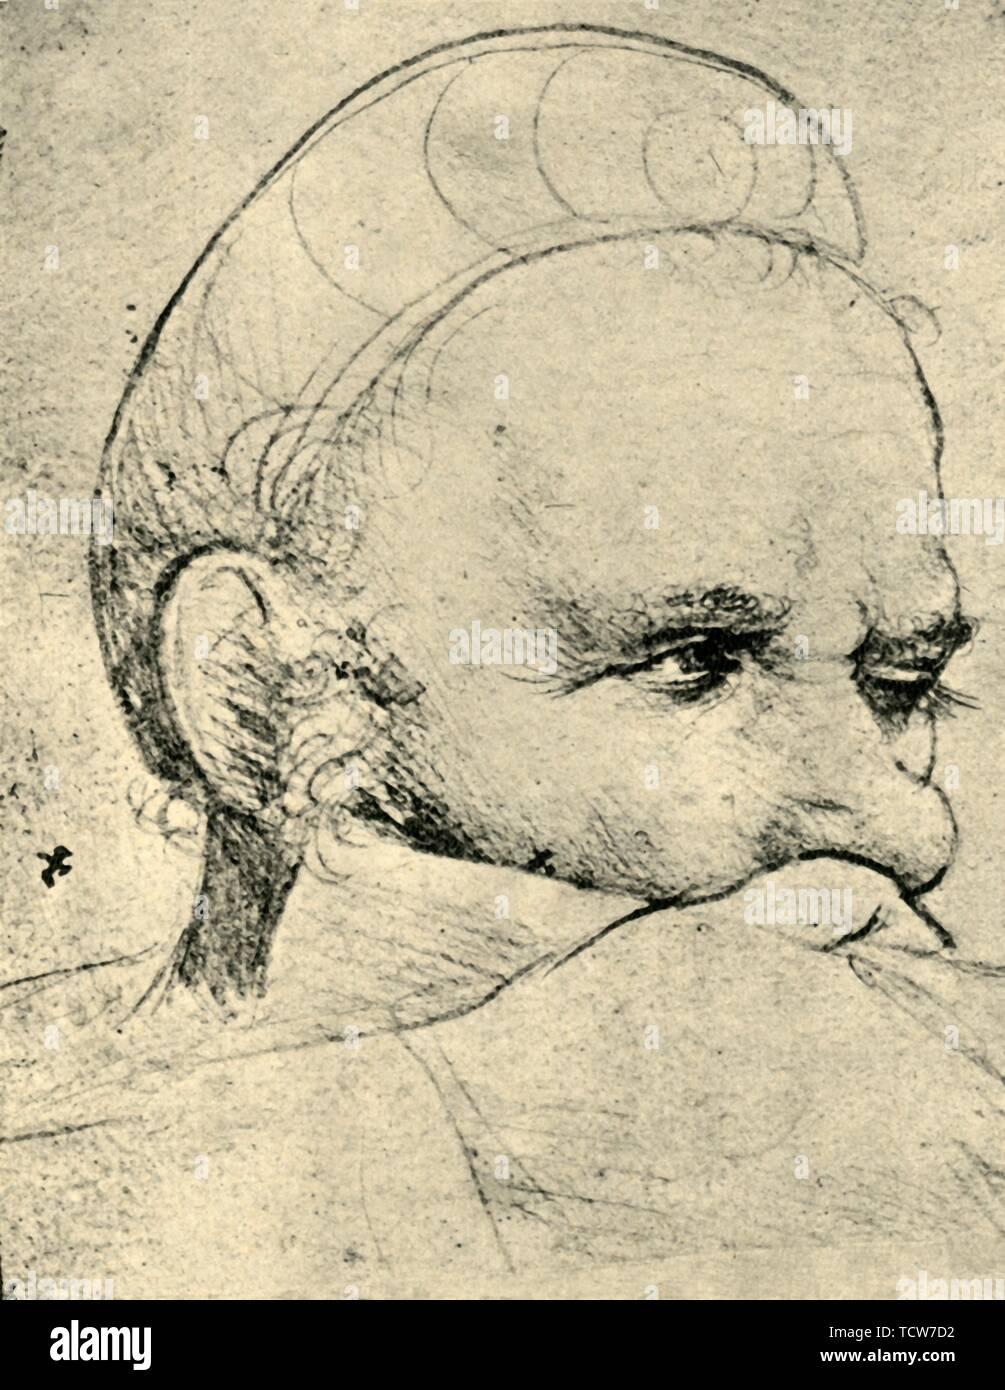 Hans Holbein The Elder Immagini e Fotos Stock - Alamy